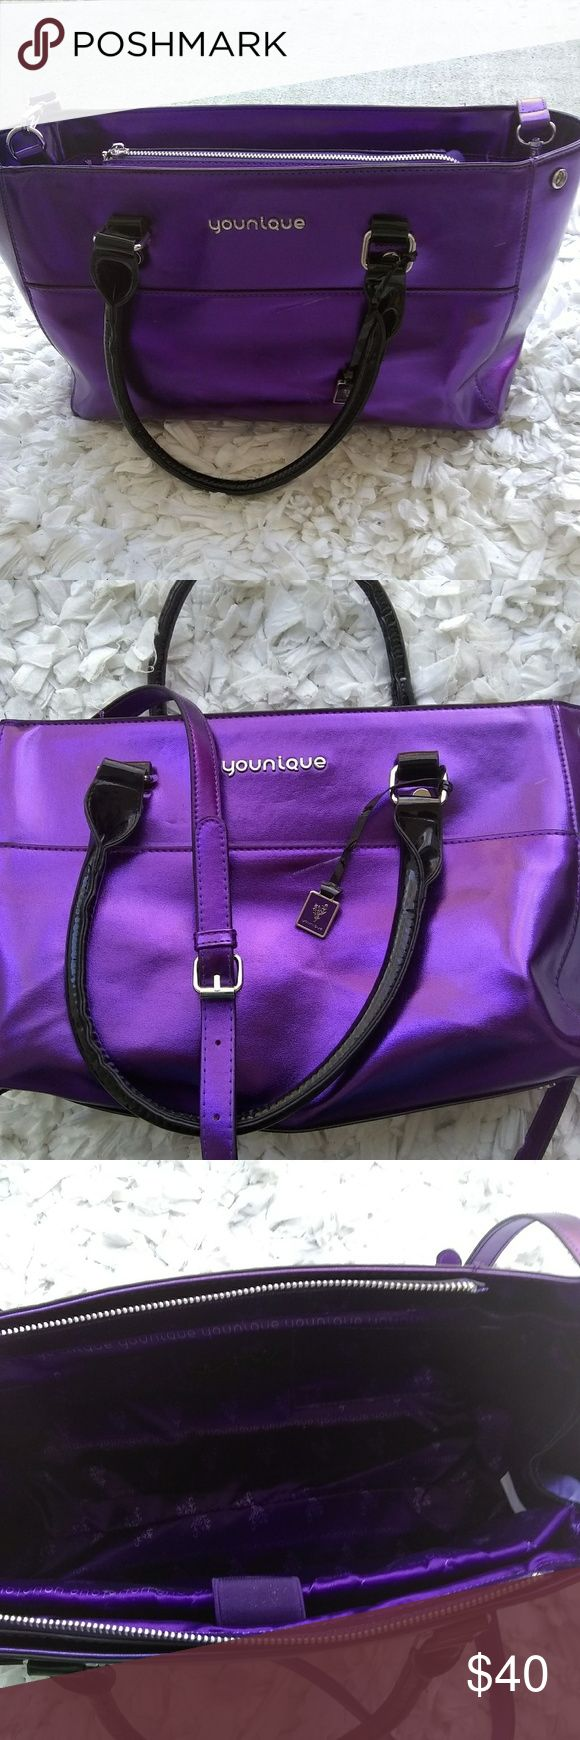 Younique Large presenter Makeup Bag Tote Purple Bags